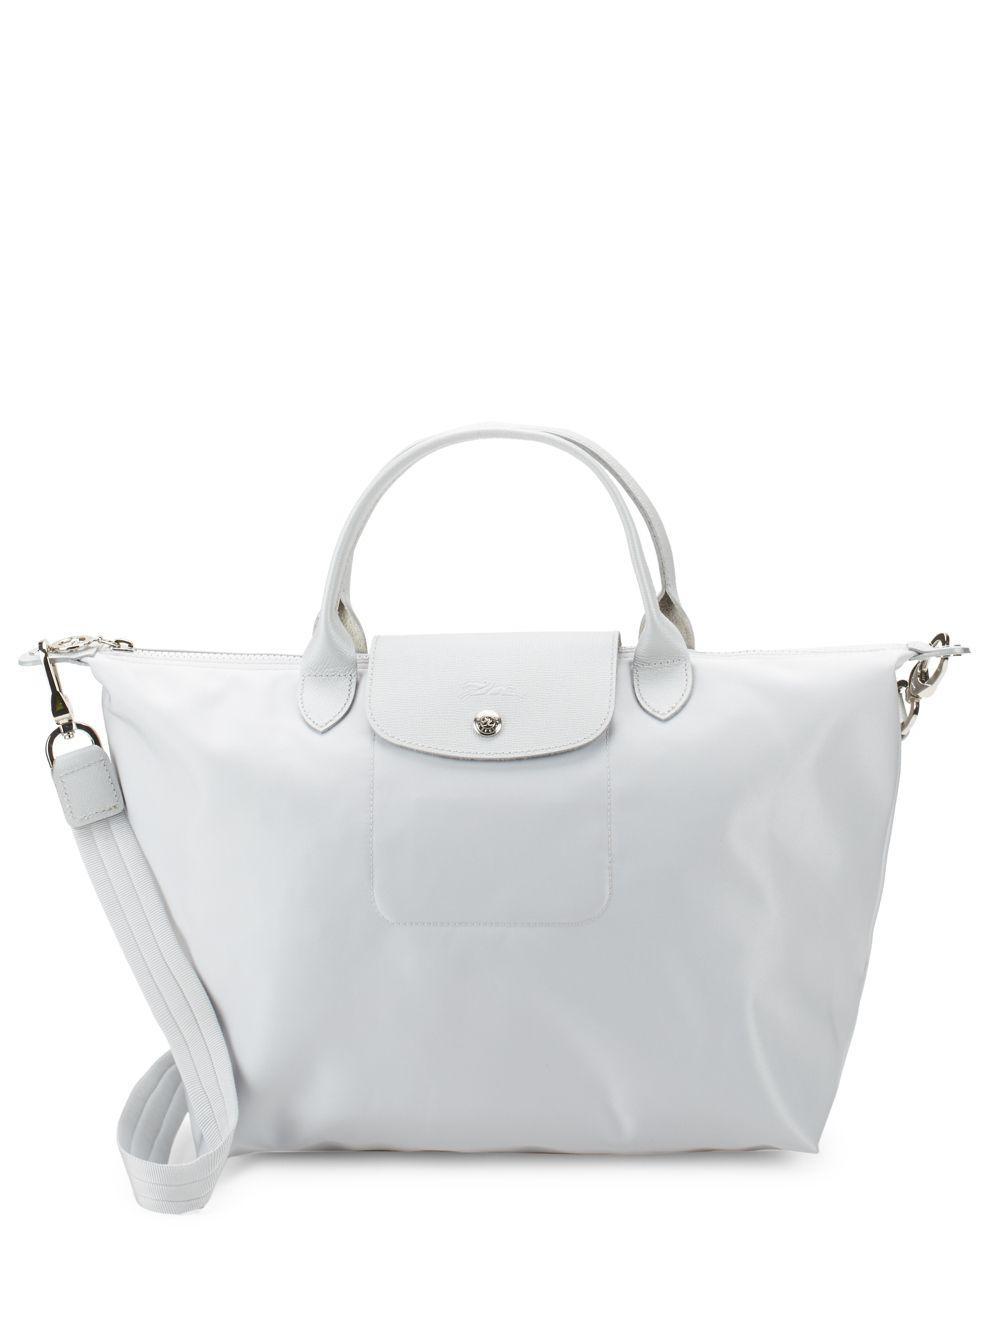 eb1a1cecfc1b Longchamp Le Pliage Neo Medium Top Handle Bag in Metallic - Lyst